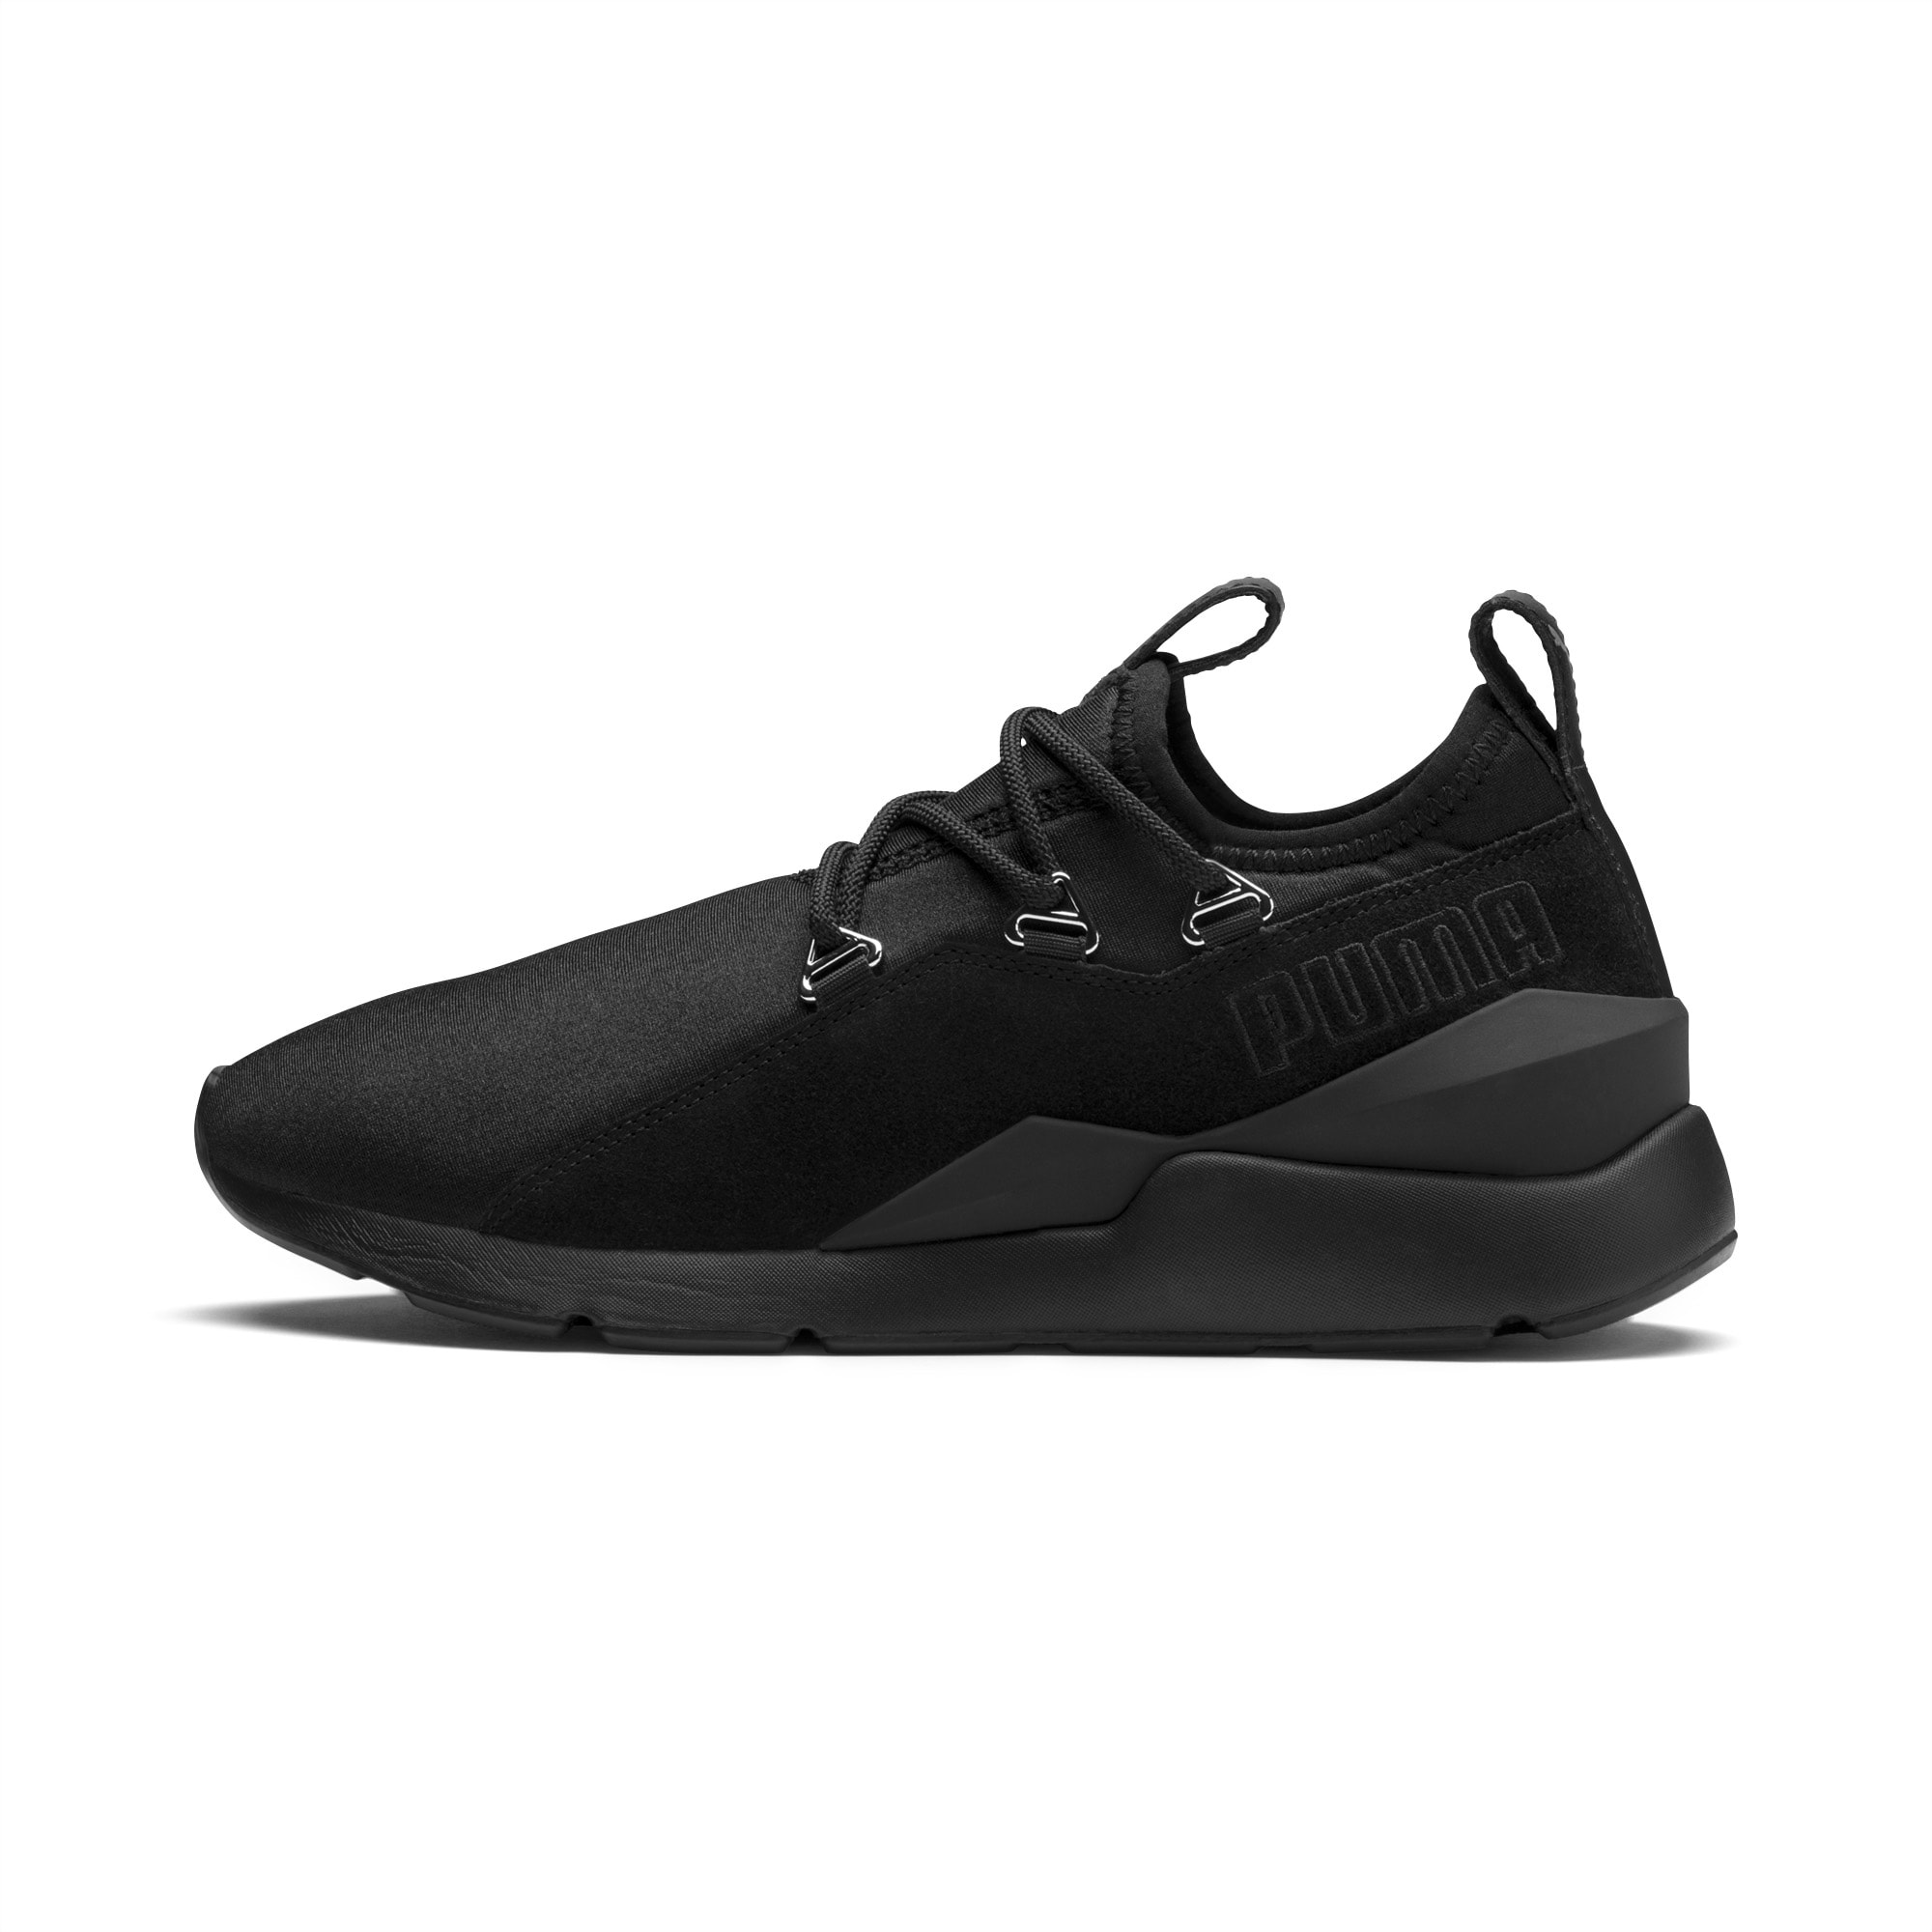 Muse 2 Women's Sneakers